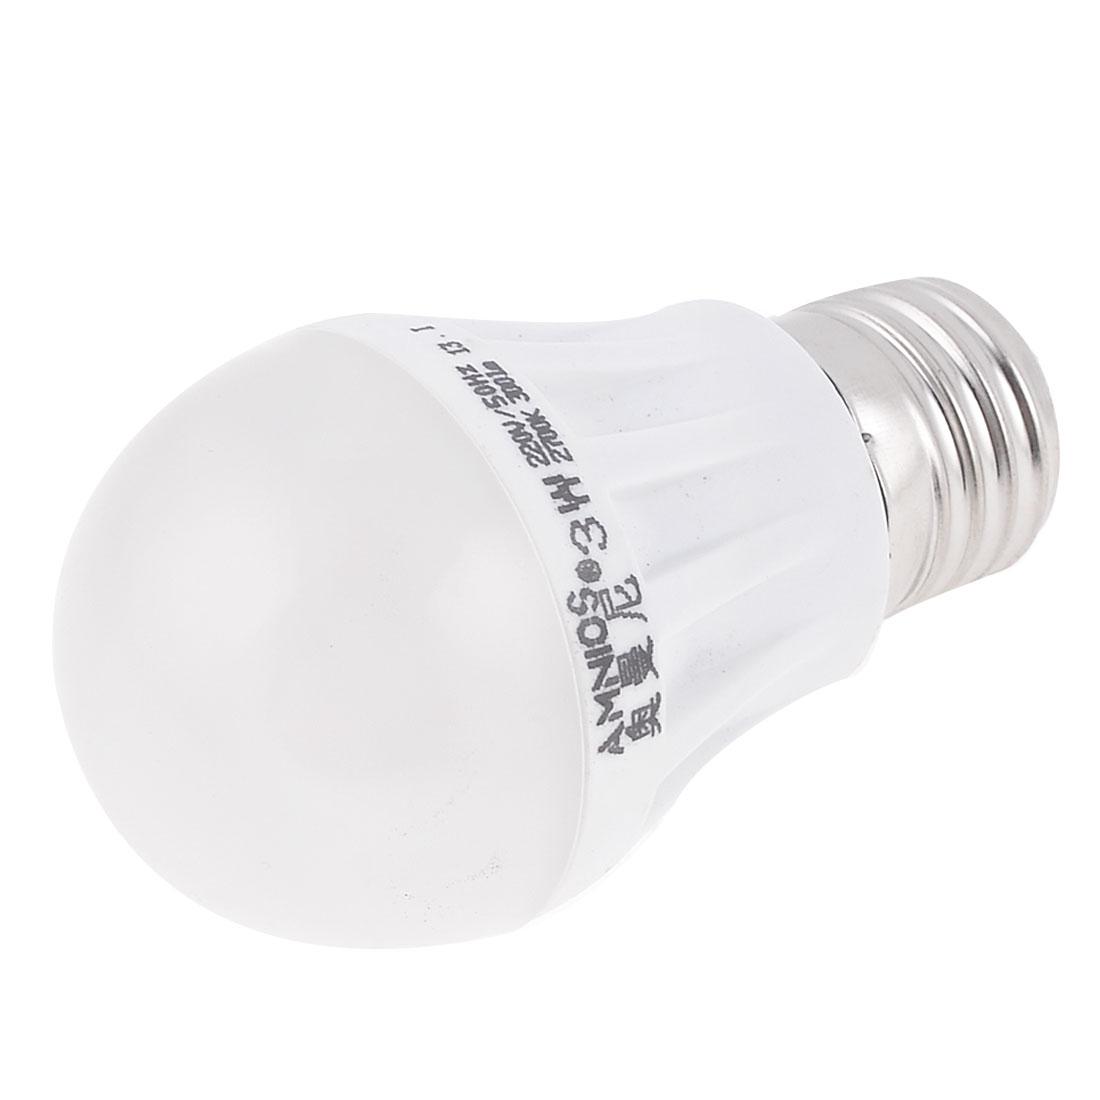 E27 Screw Base Warm White LED Globe Bulb Light Lamp 3W AC 220V